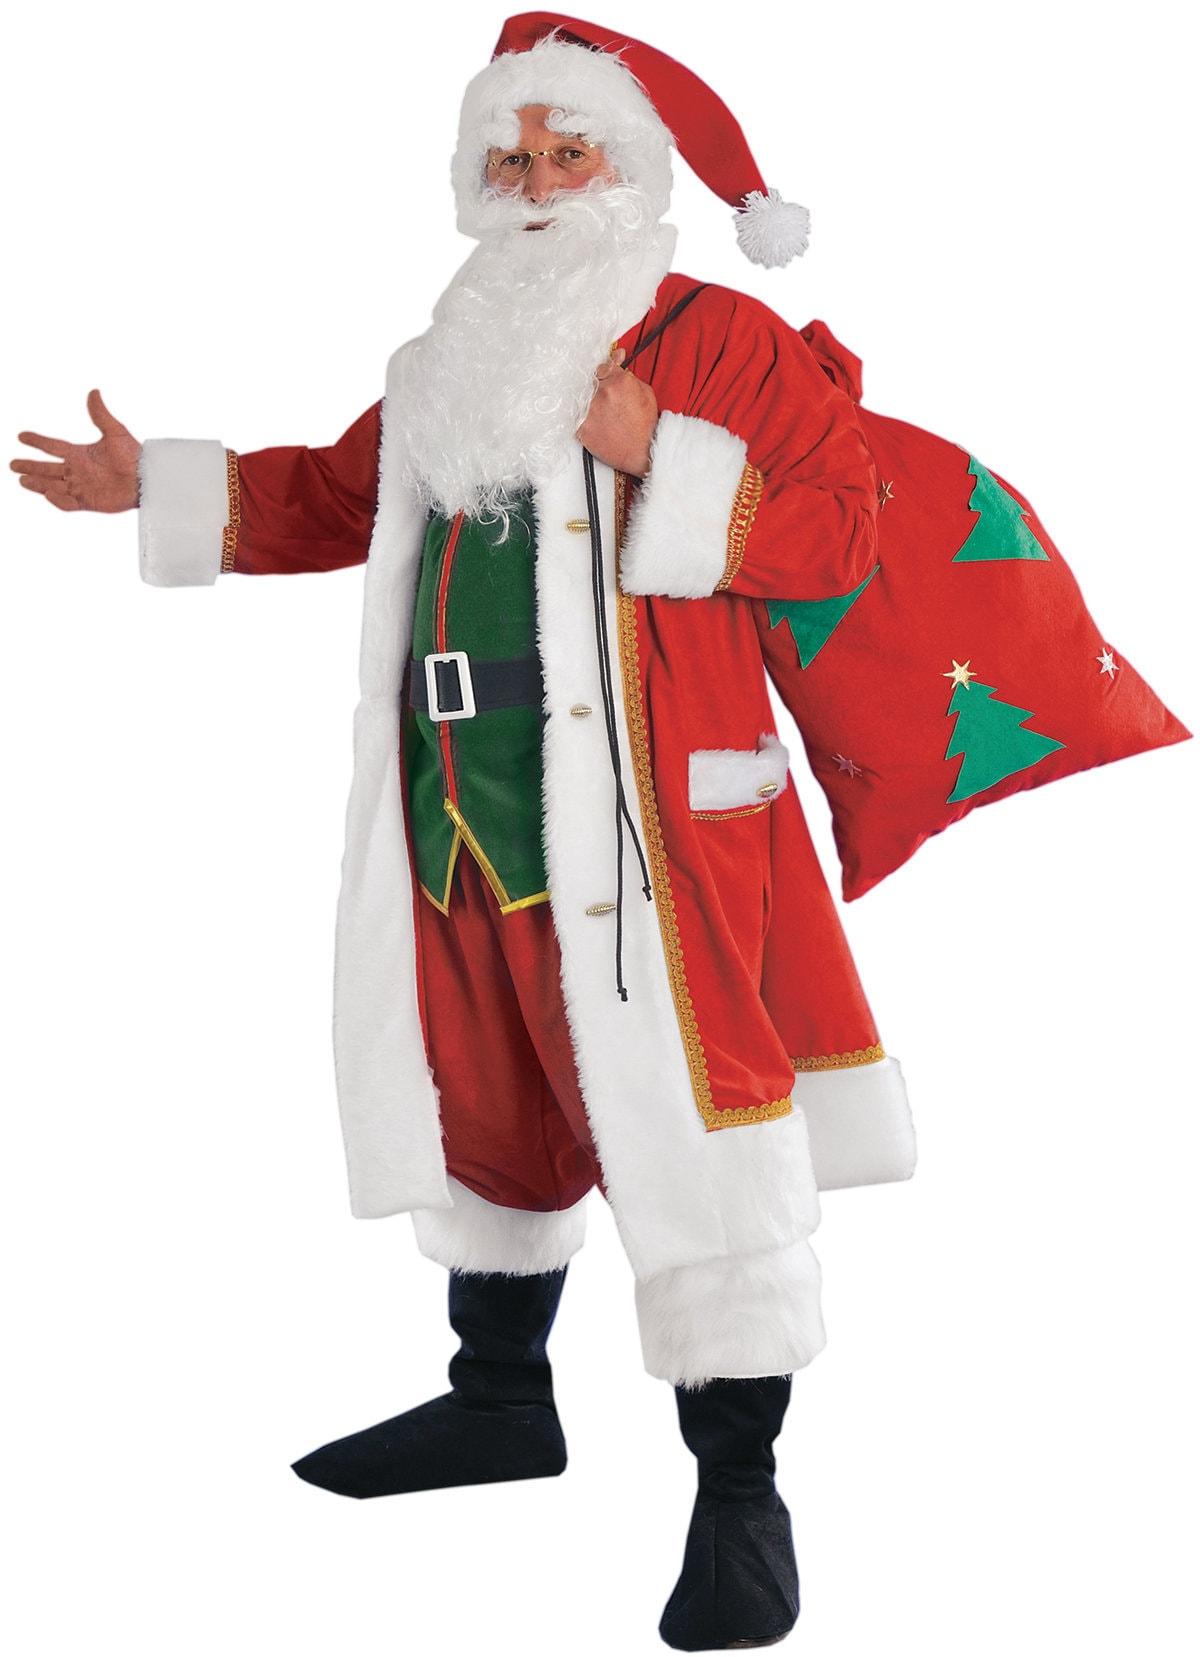 10 Piece Santa Claus Suit Adult 2 Sizes Costume Velvet Burgundy